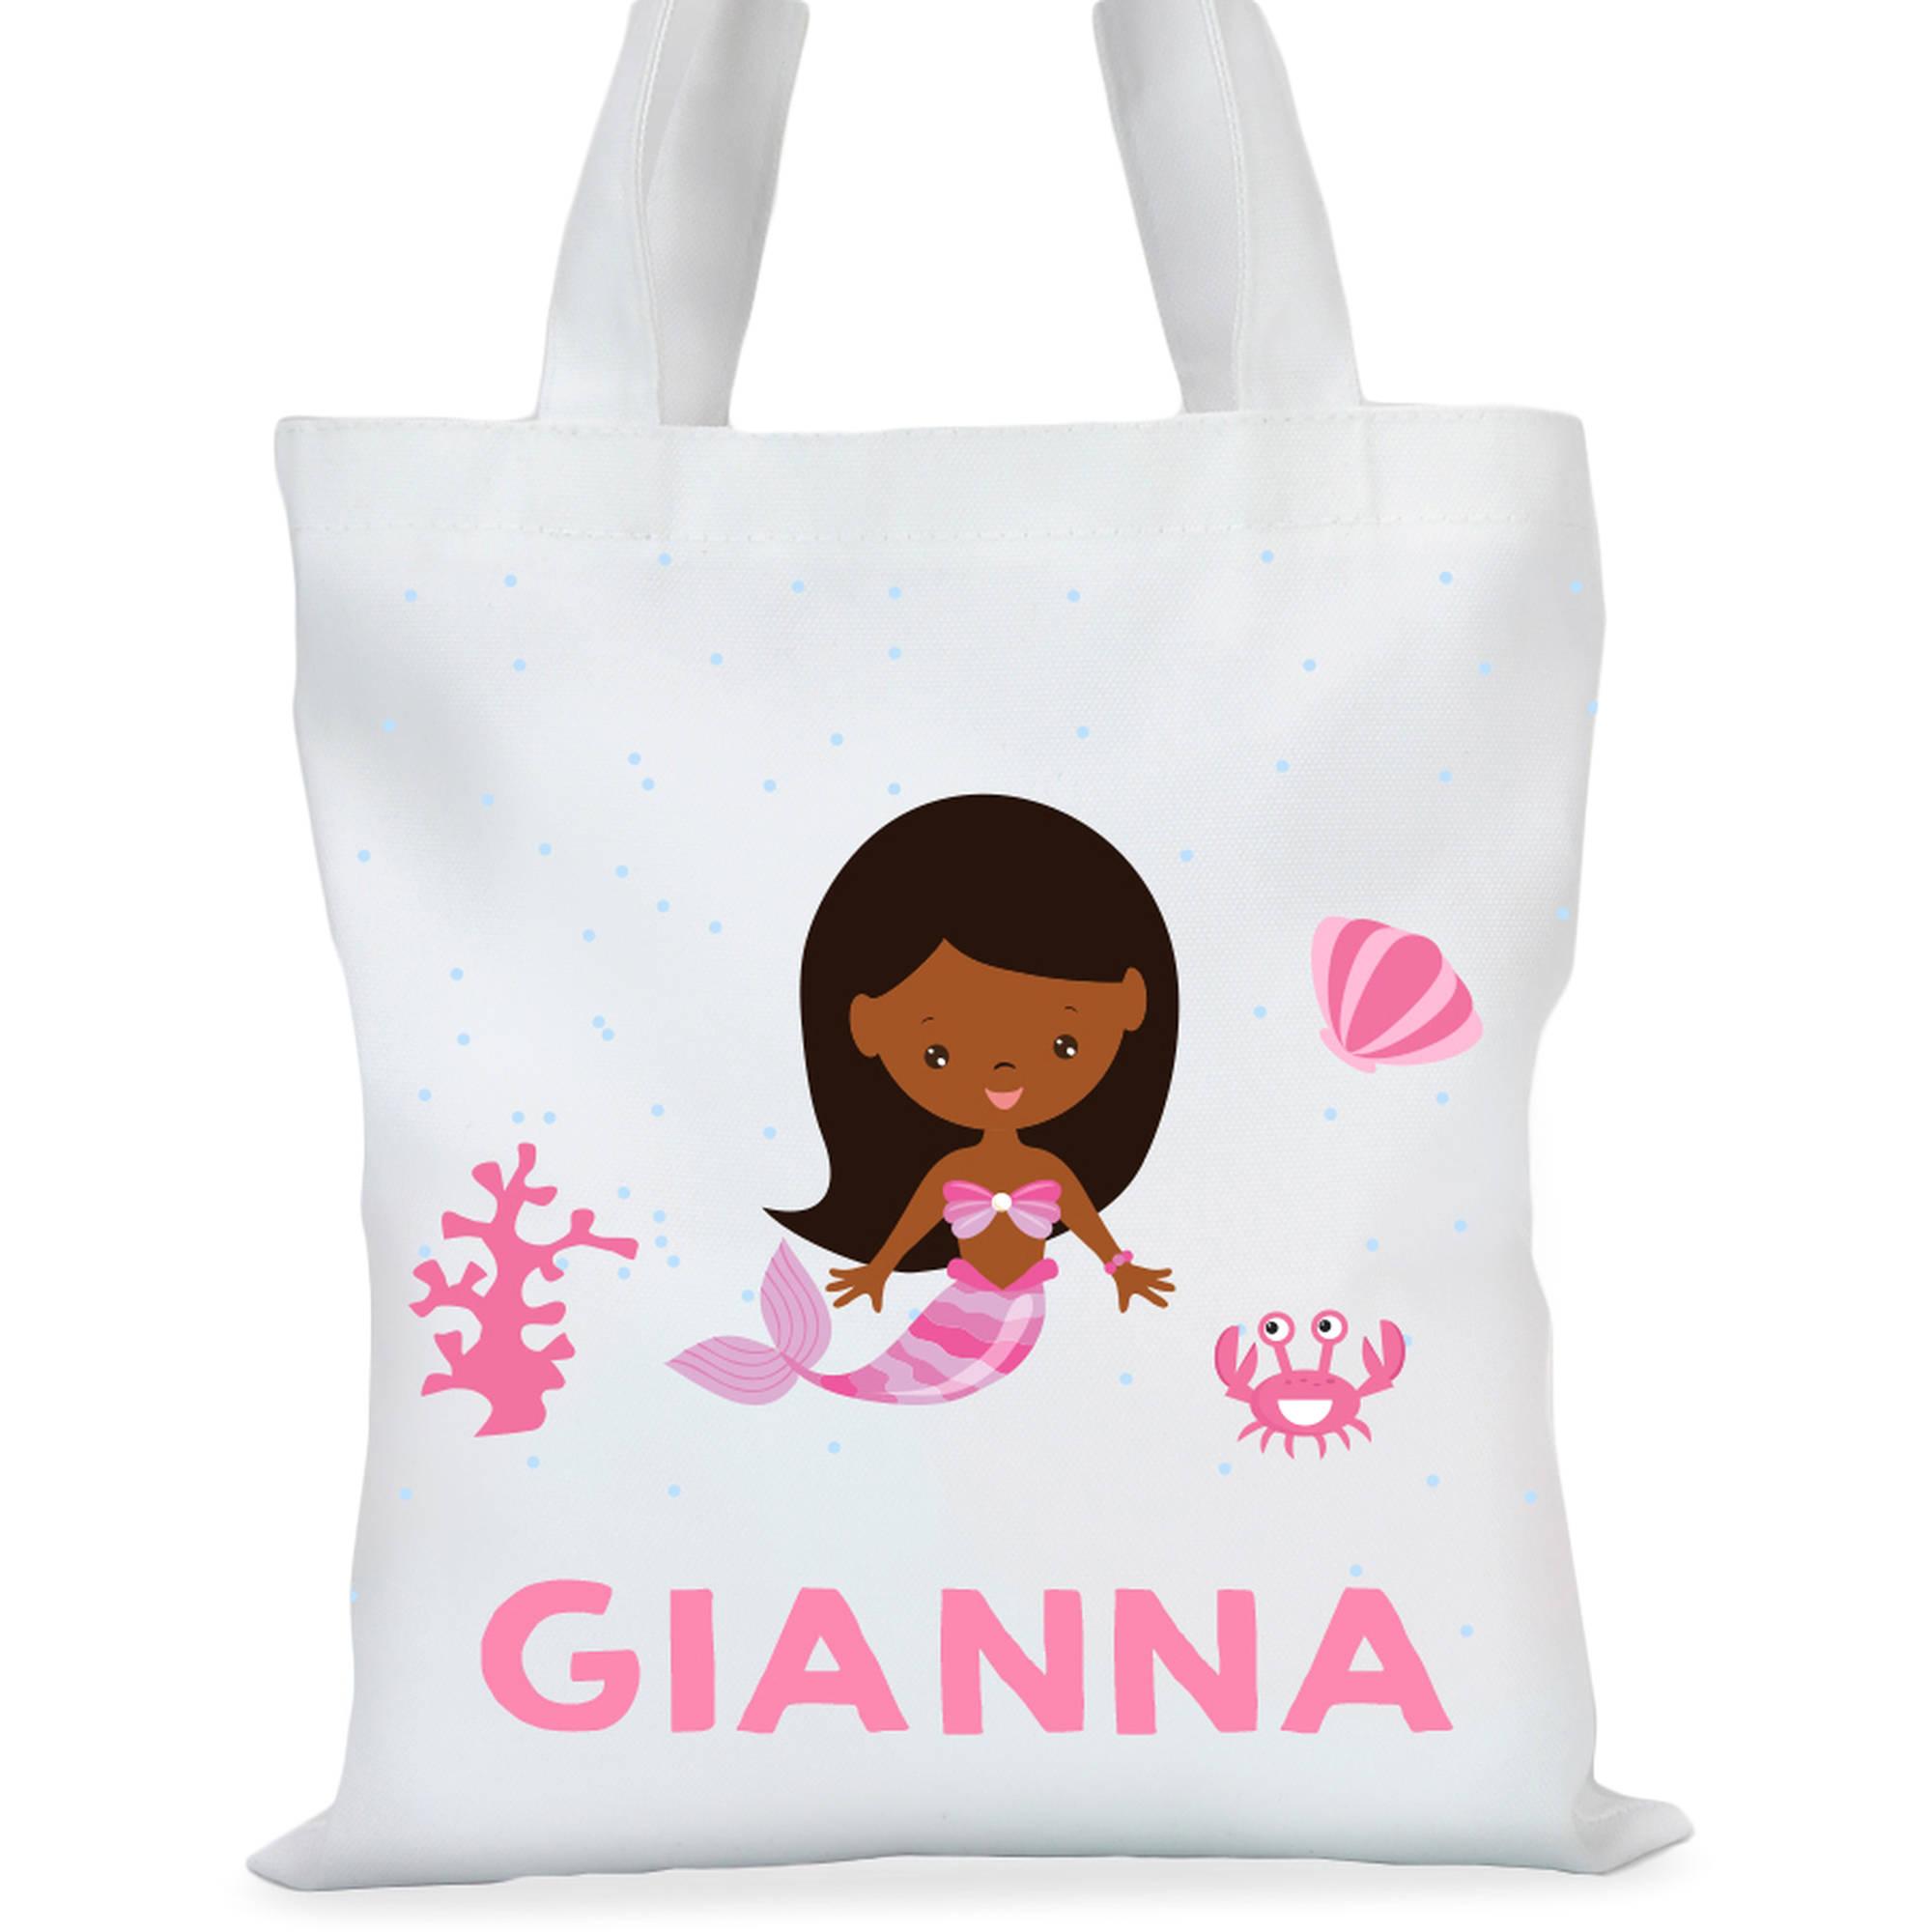 "Mermaid Princess Custom Girls Tote Bag, Sizes 11"" x 11.75"" and 15"" x 16.25"""